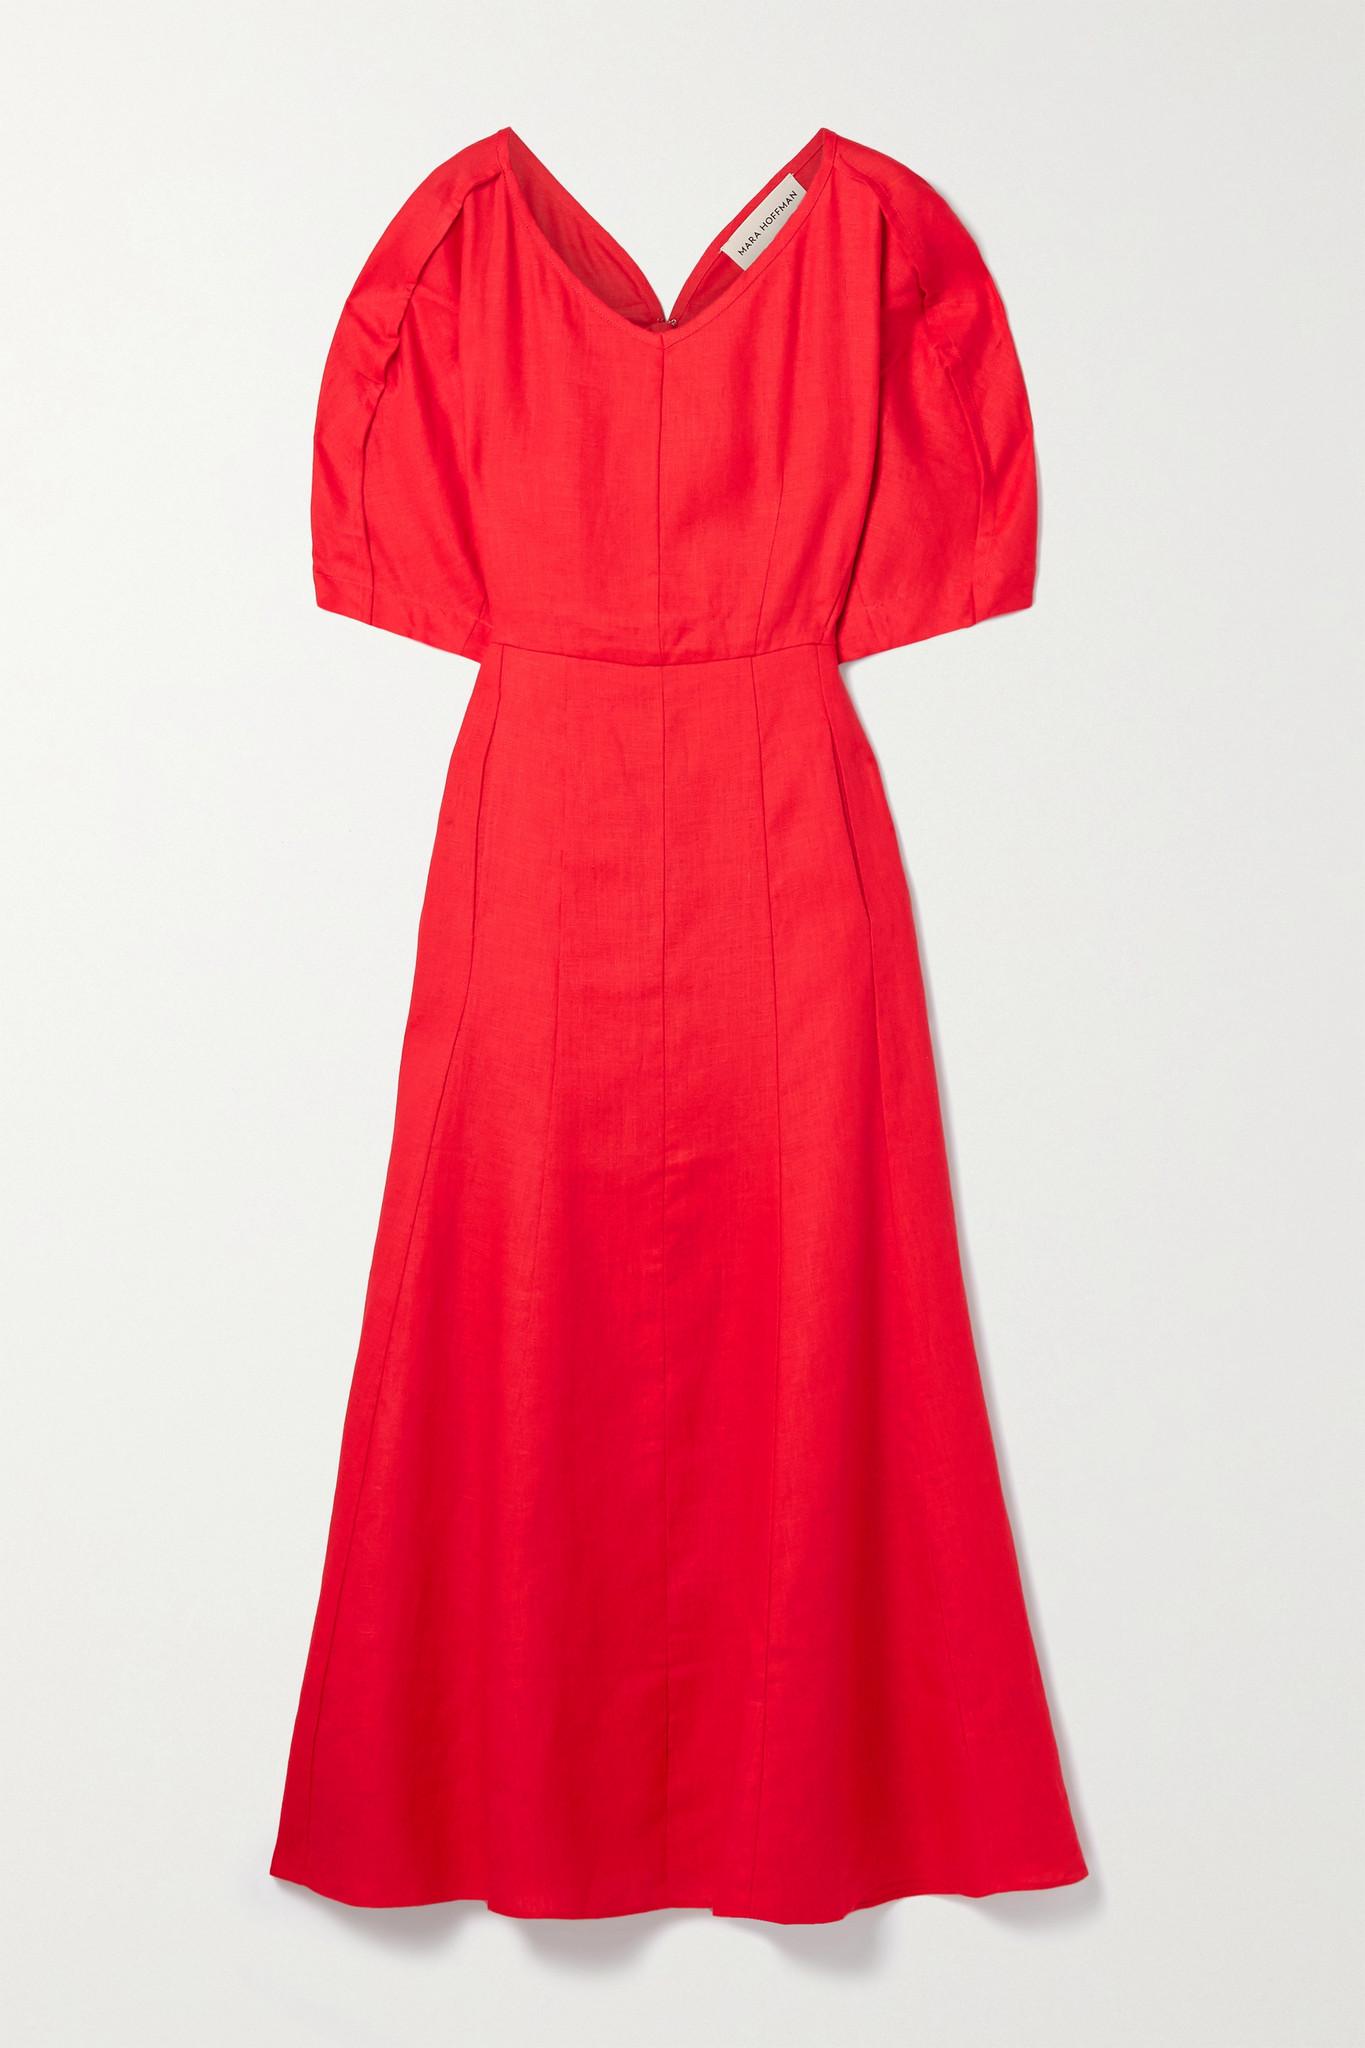 MARA HOFFMAN - 【net Sustain】sicily 汉麻中长连衣裙 - 红色 - US00